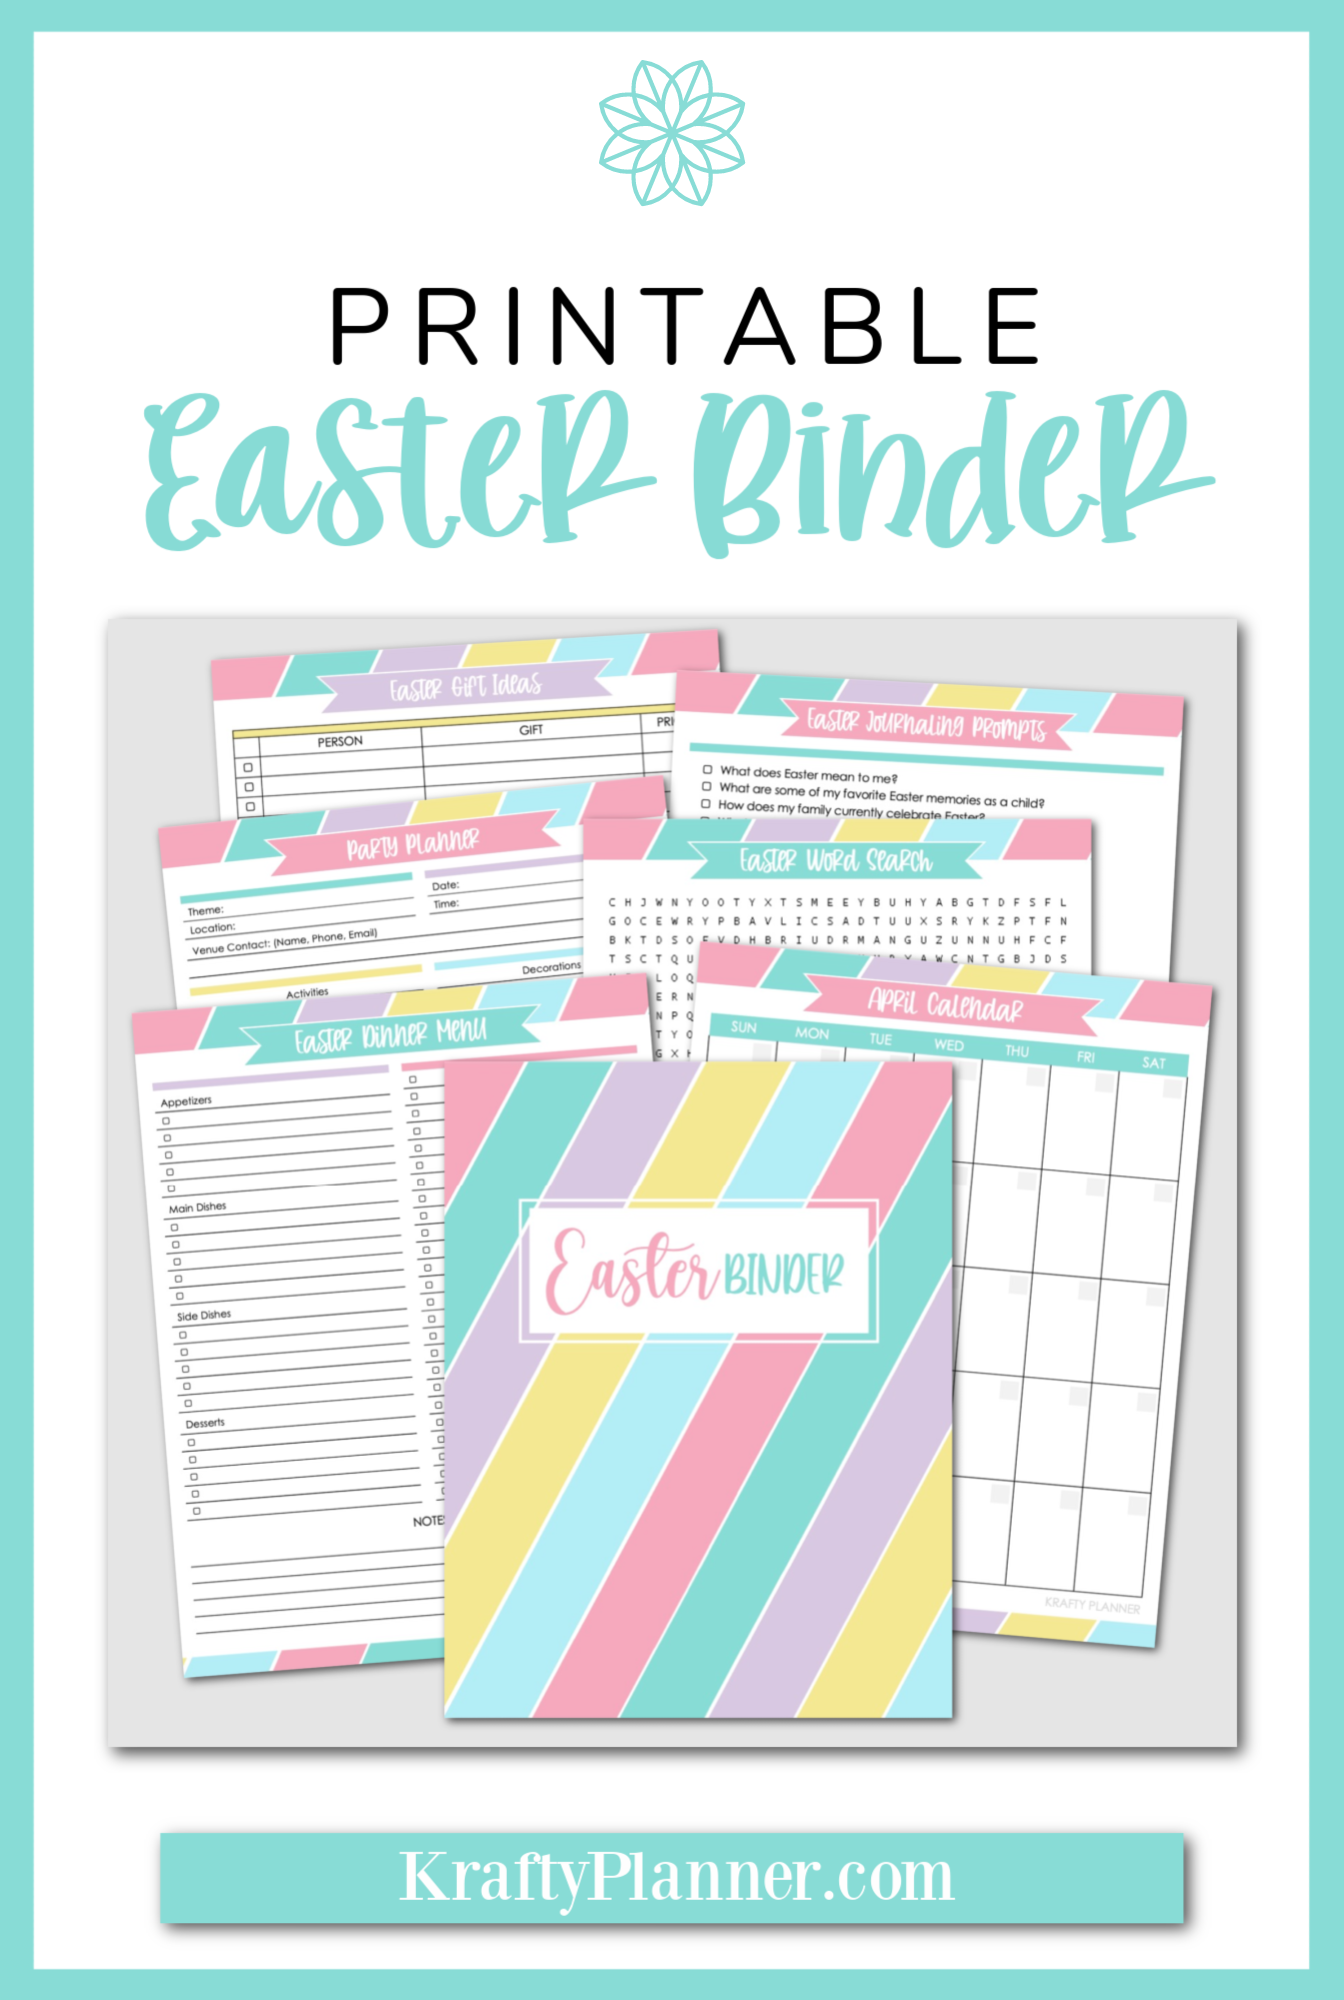 Printable Easter Binder PIN 2.png